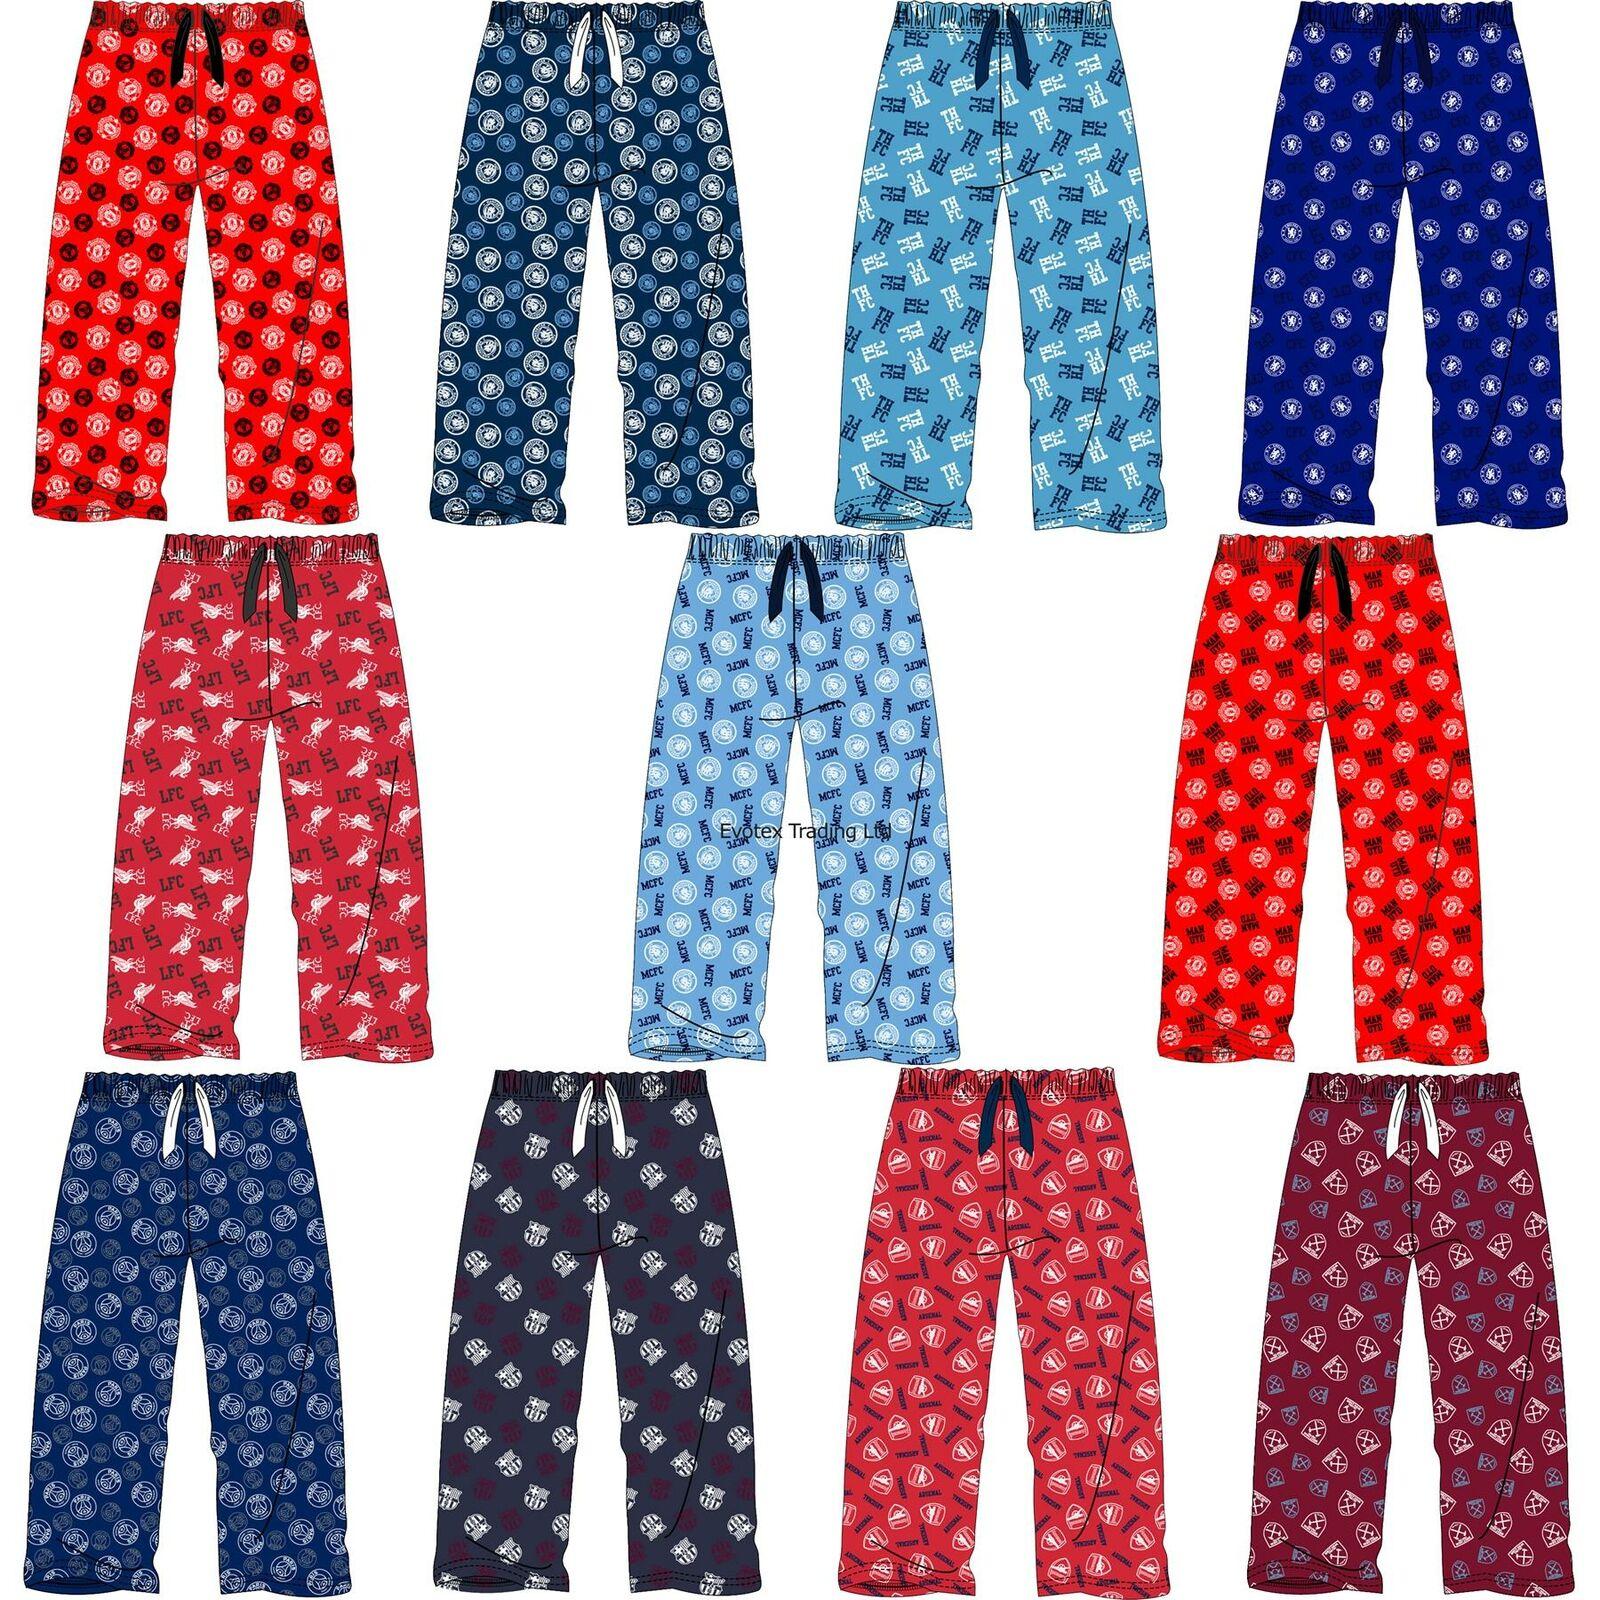 100/% Cotton Pyjama Bottoms Official Adults West Ham United Soccer Lounge Pants